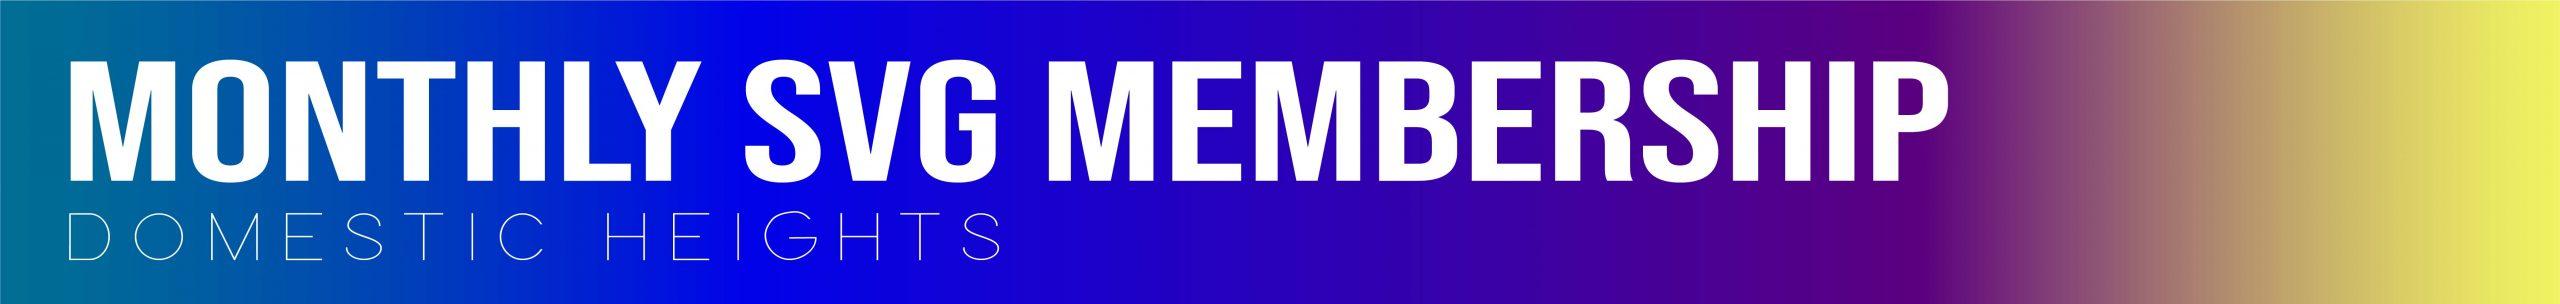 Monthly Member header